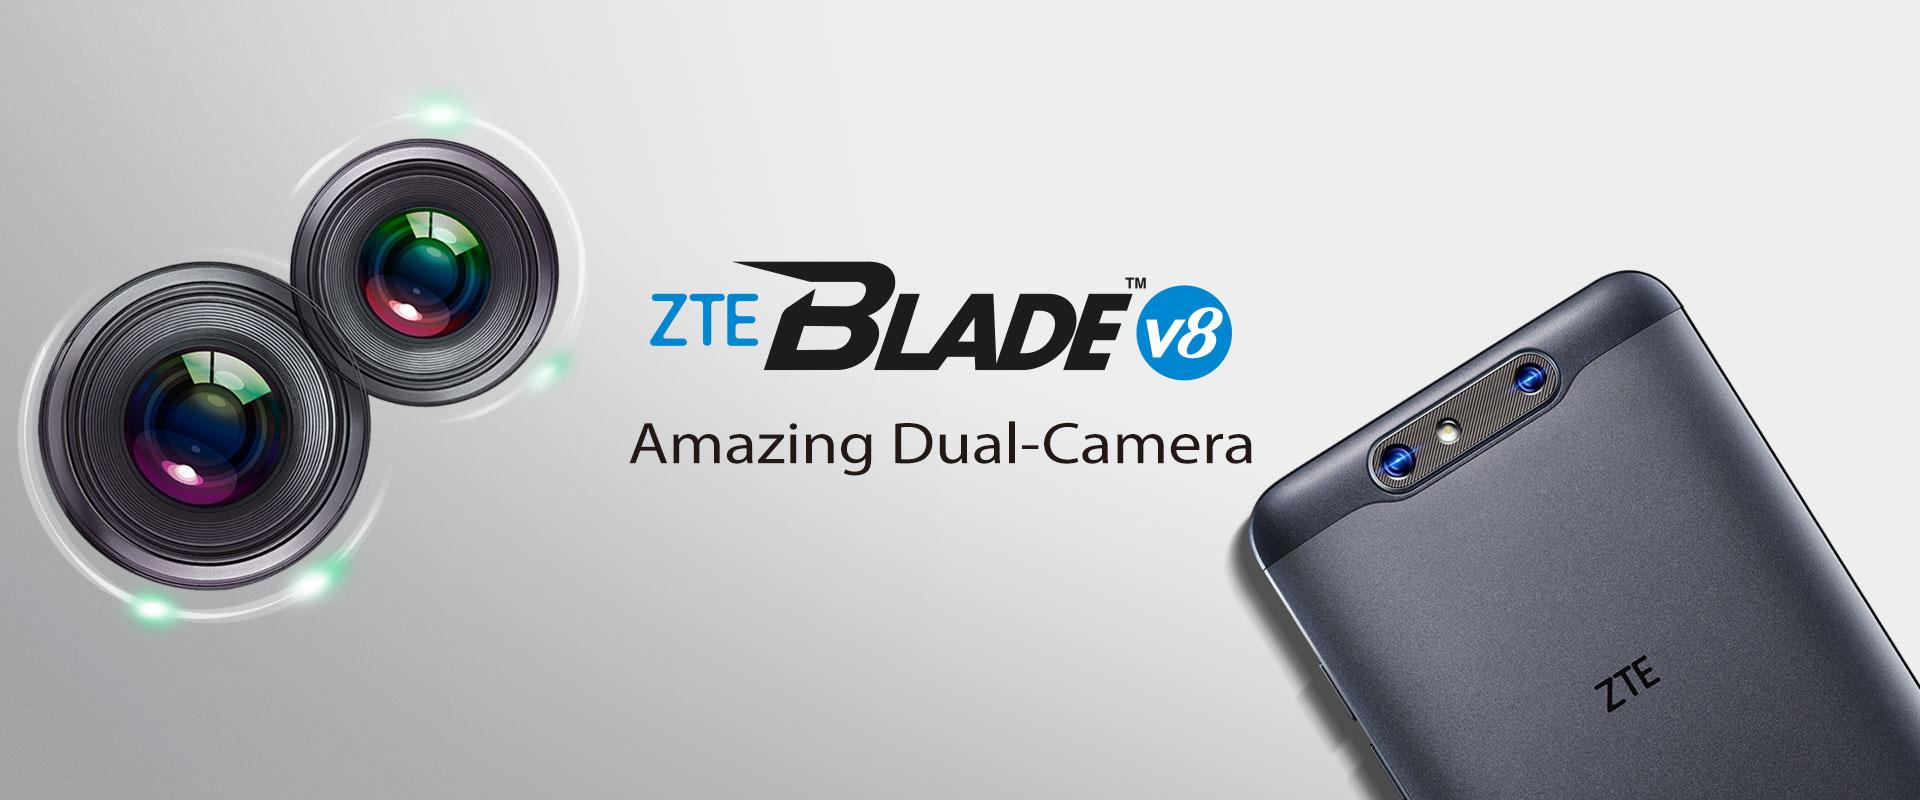 ZTE BLADE V8-WEB